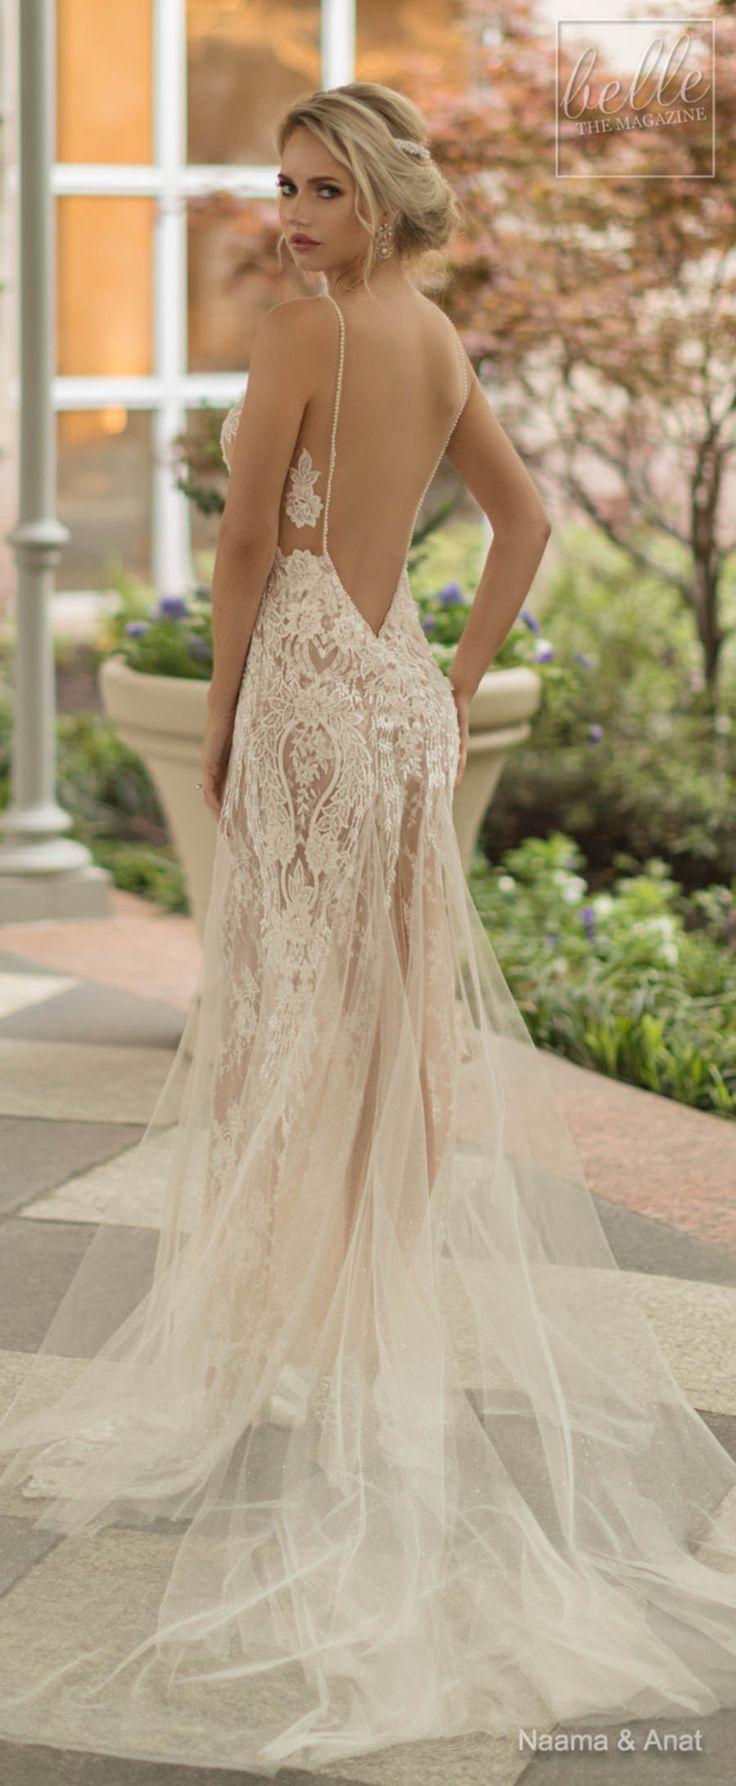 best Wedding images on Pinterest  Wedding frocks Wedding